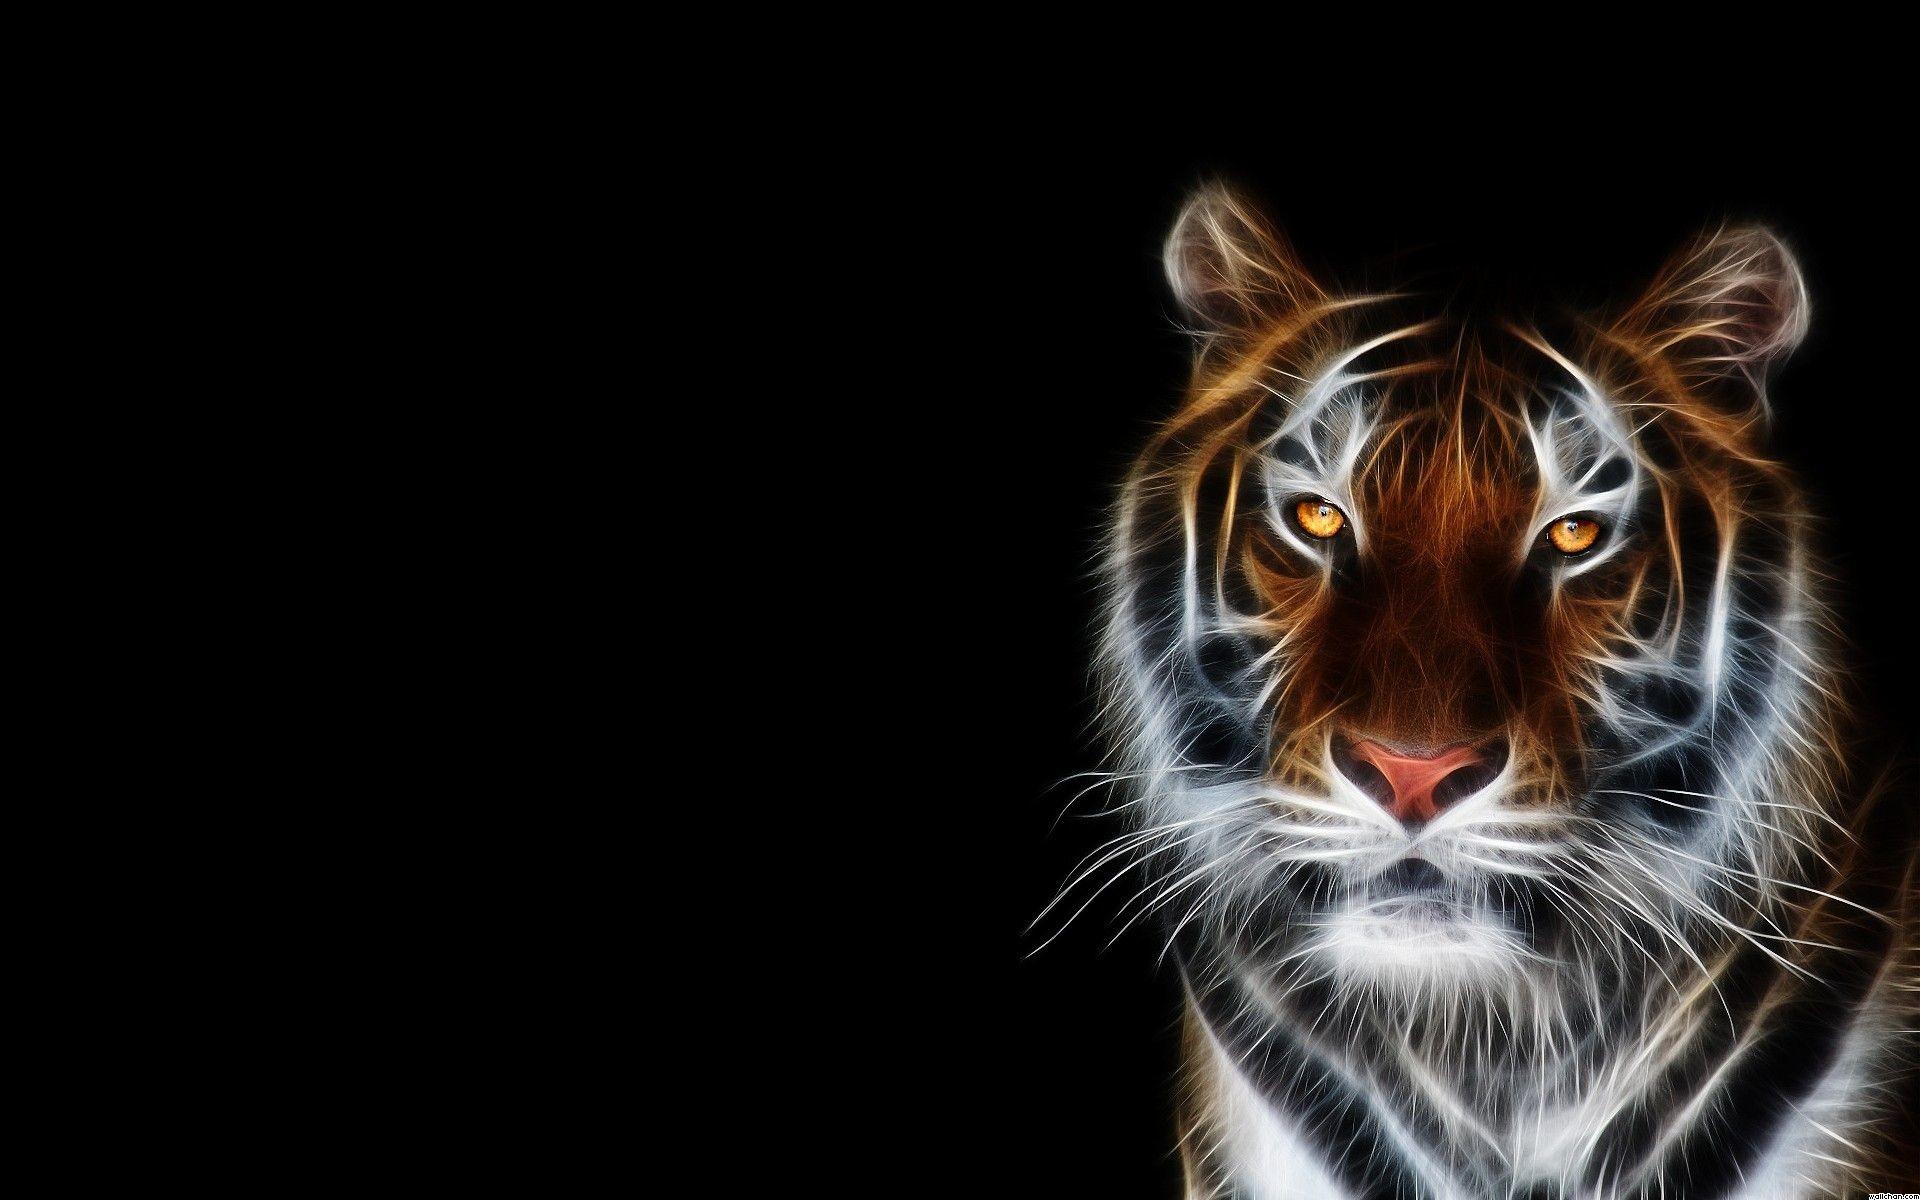 Neon Animal Backgrounds   Desktop Image